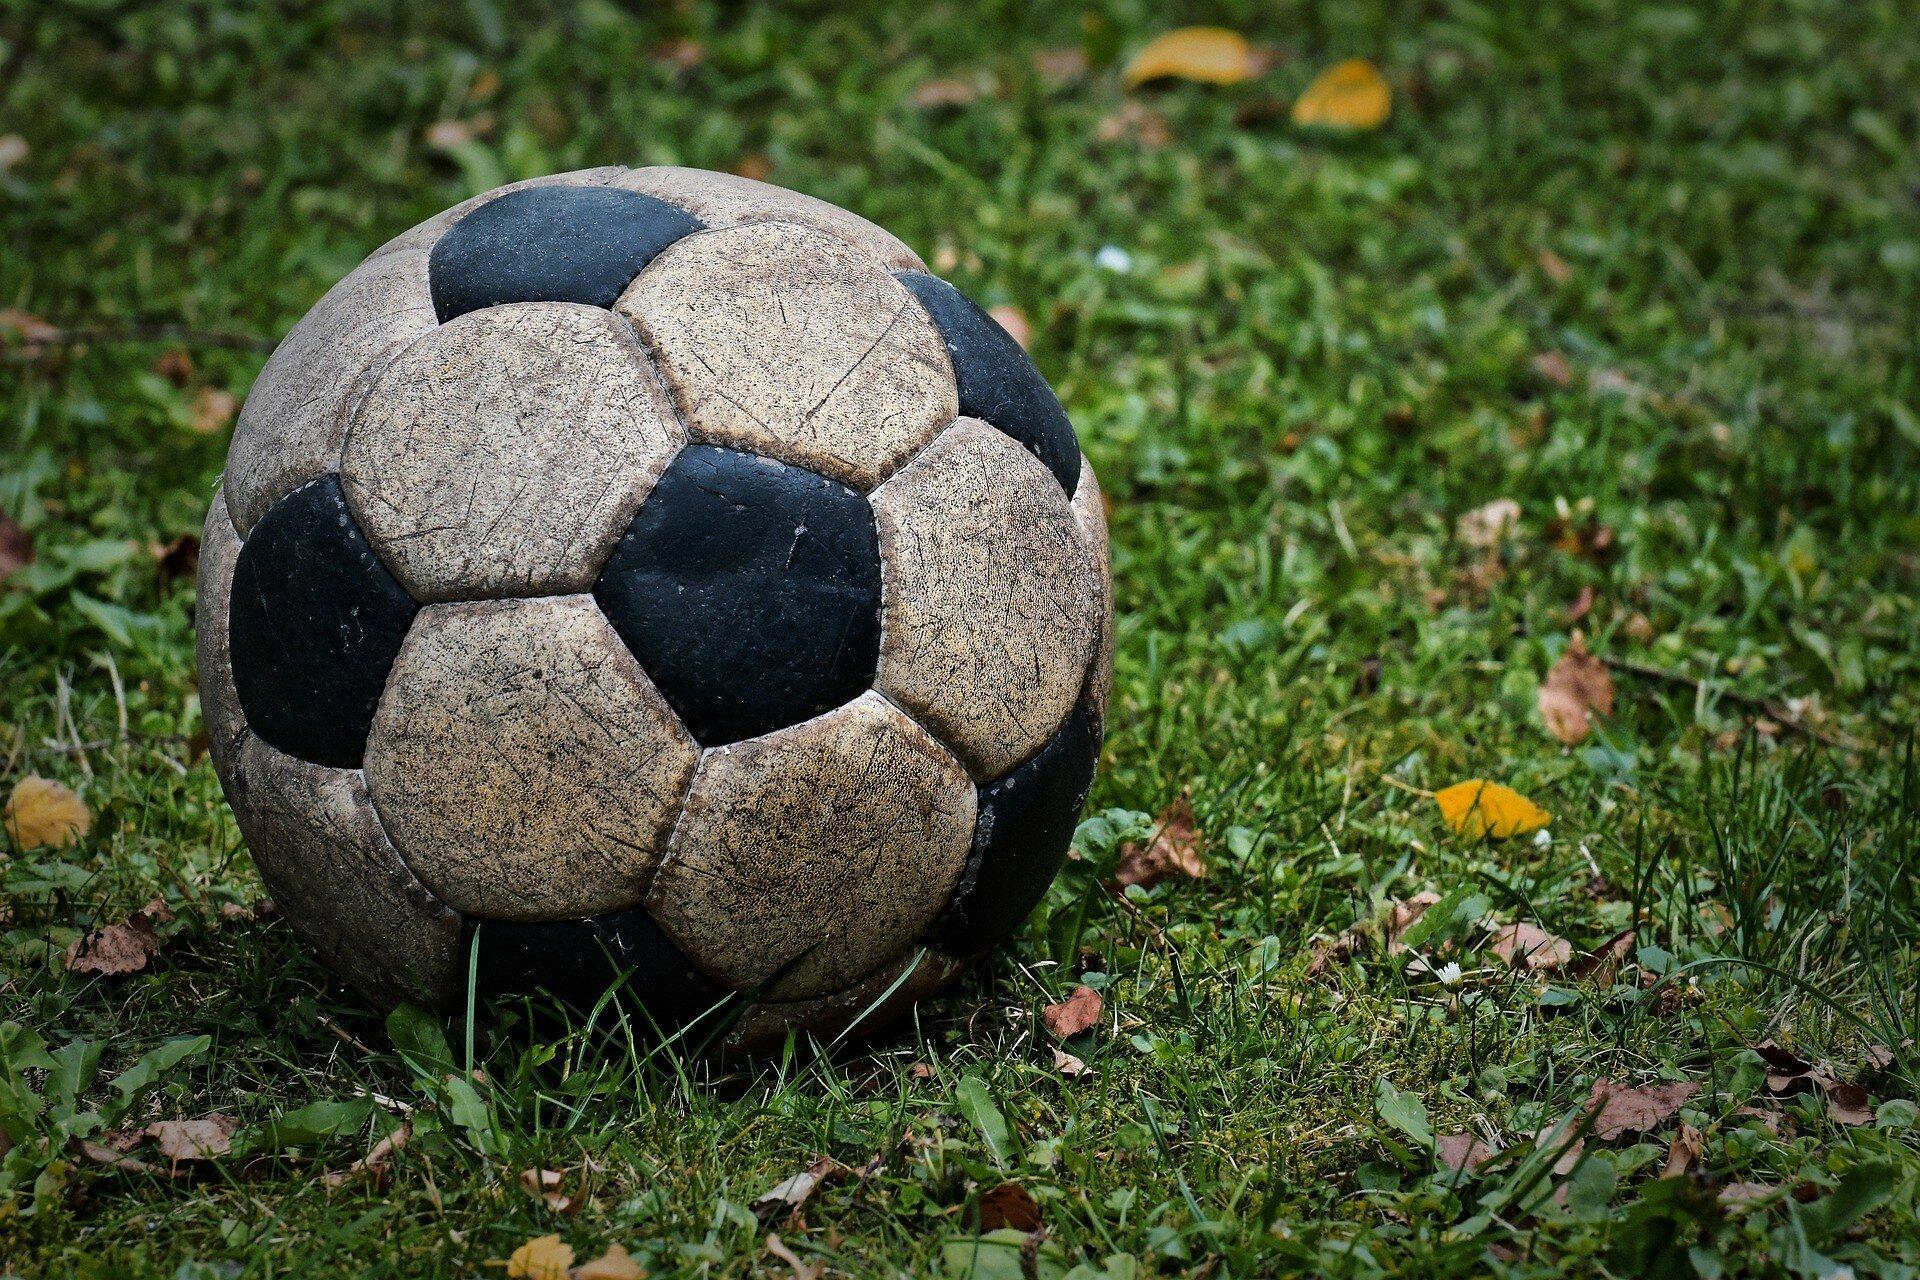 32-летний капитан английского клуба совершил самоубийство